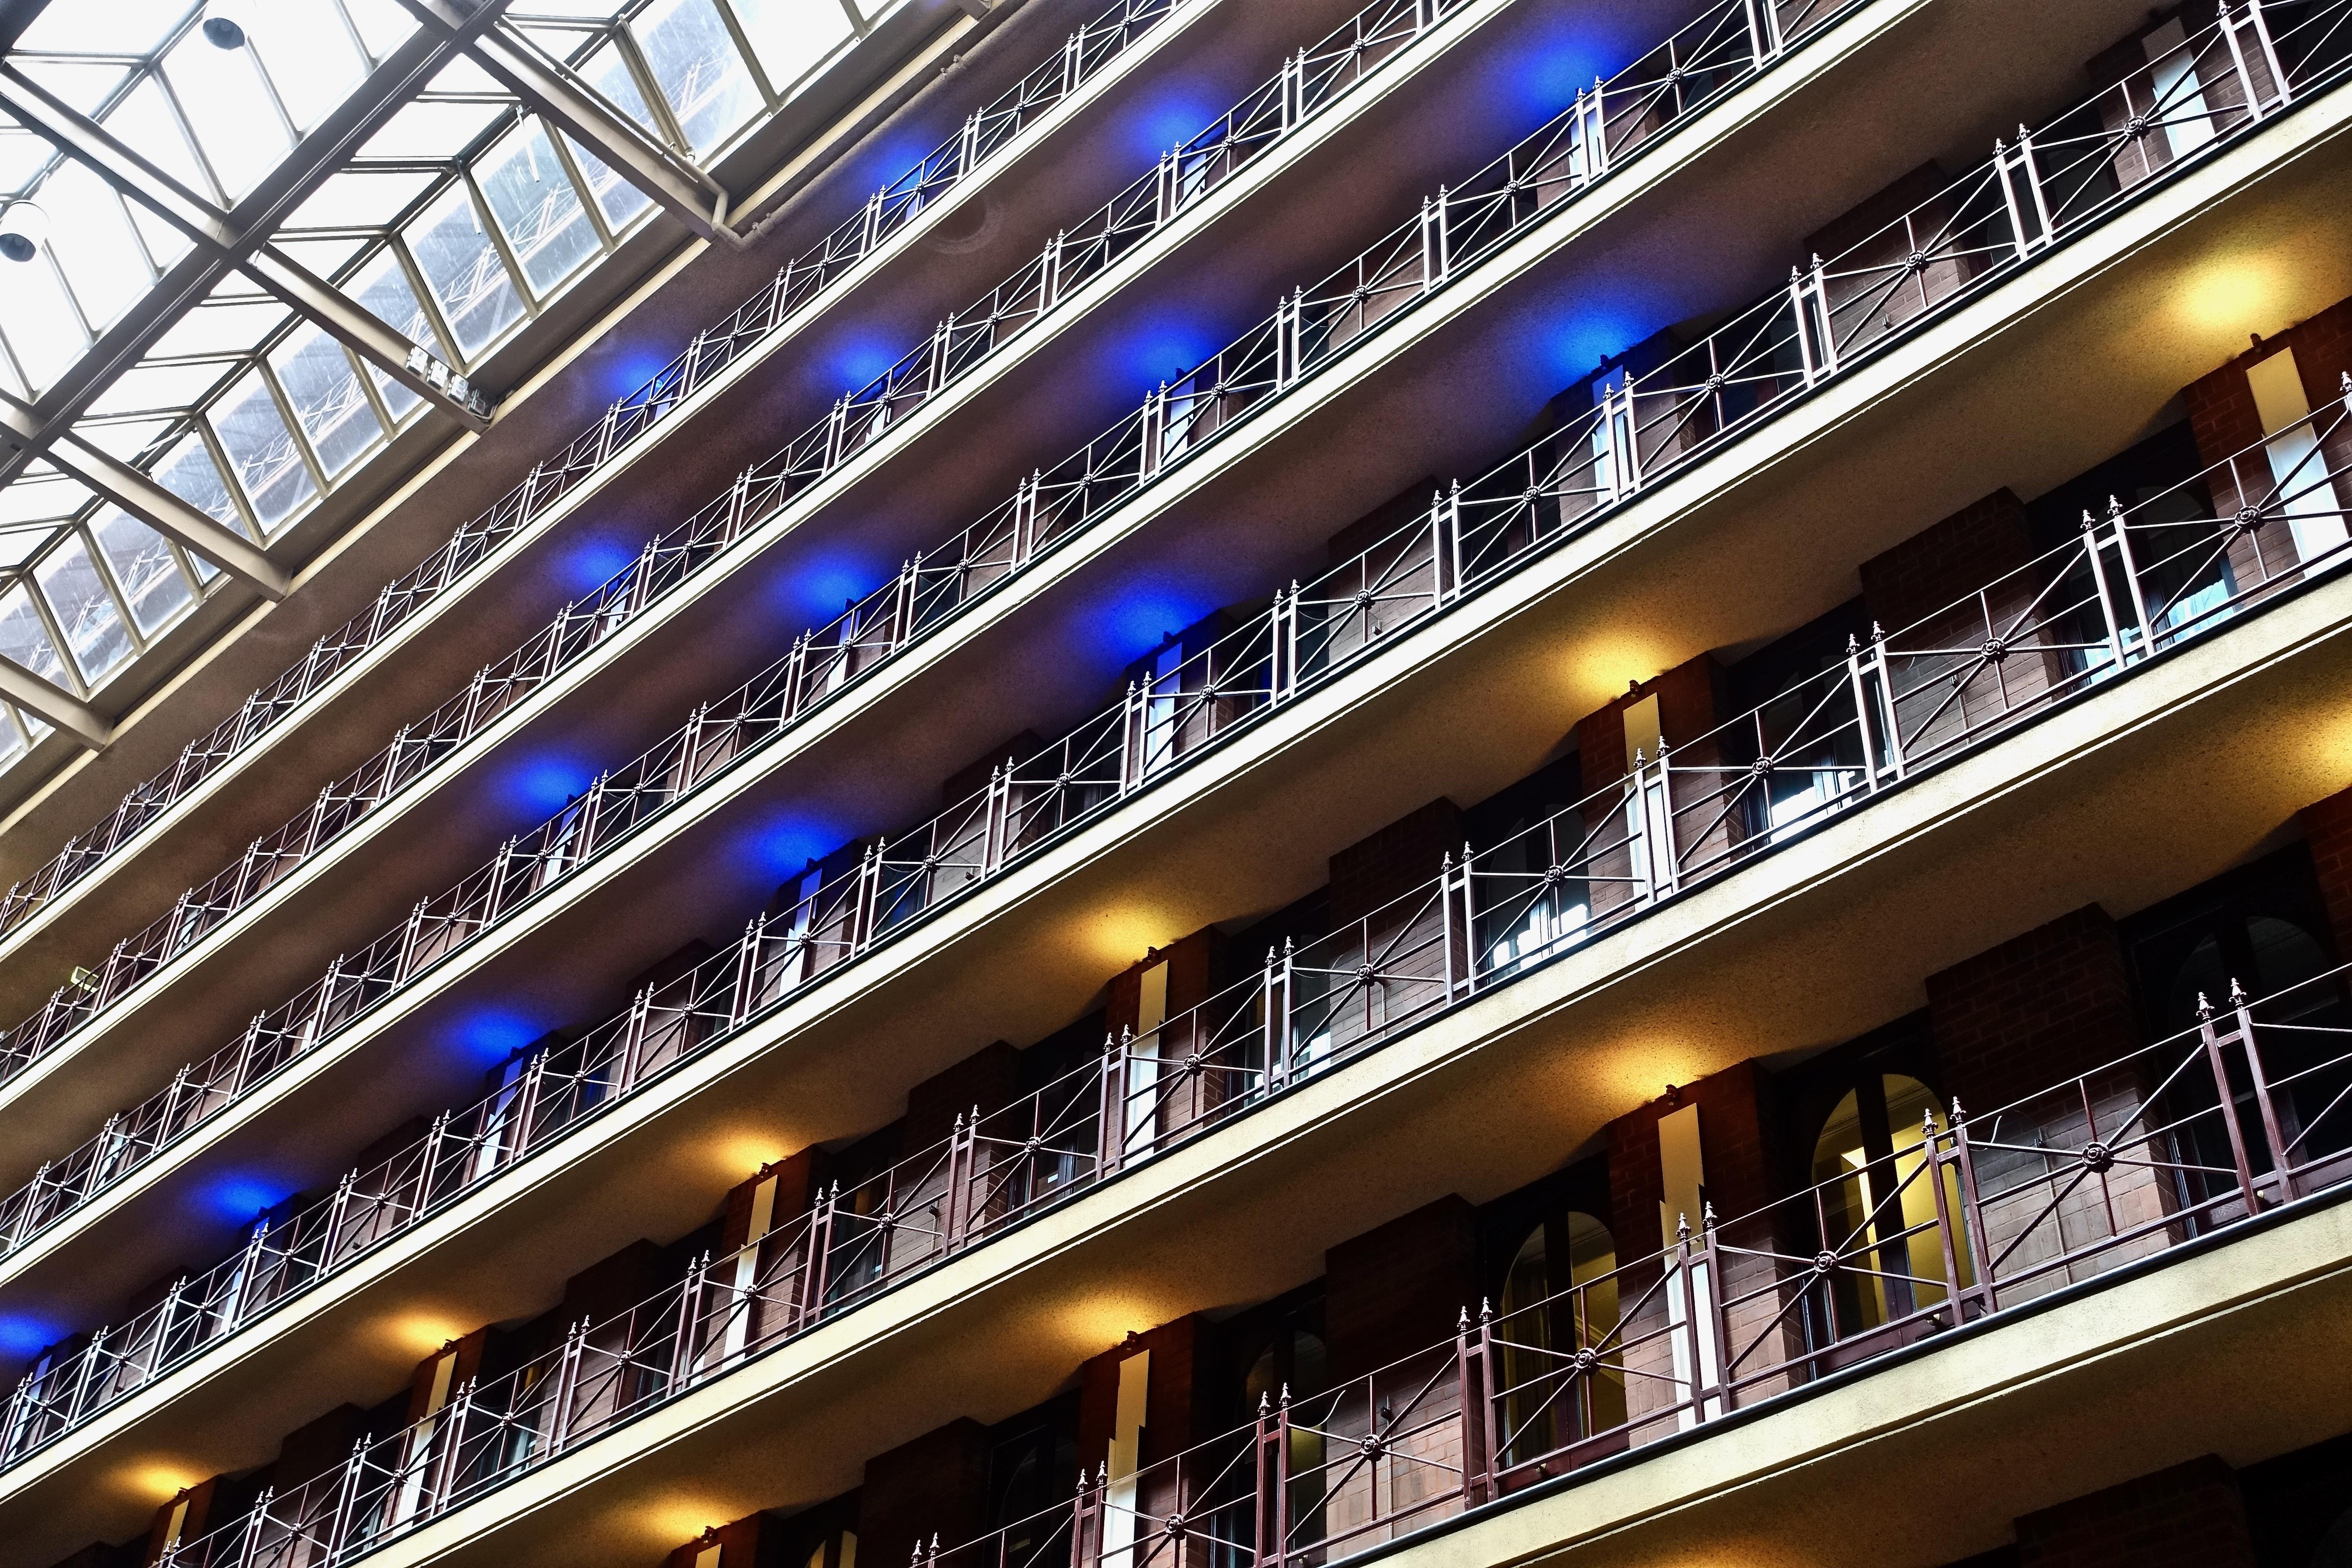 Architecture Night Building Skyscraper Facade Decor Apartment Modern Interior Design Luxury Hotel Elegant Rooms Contemporary Metropolis